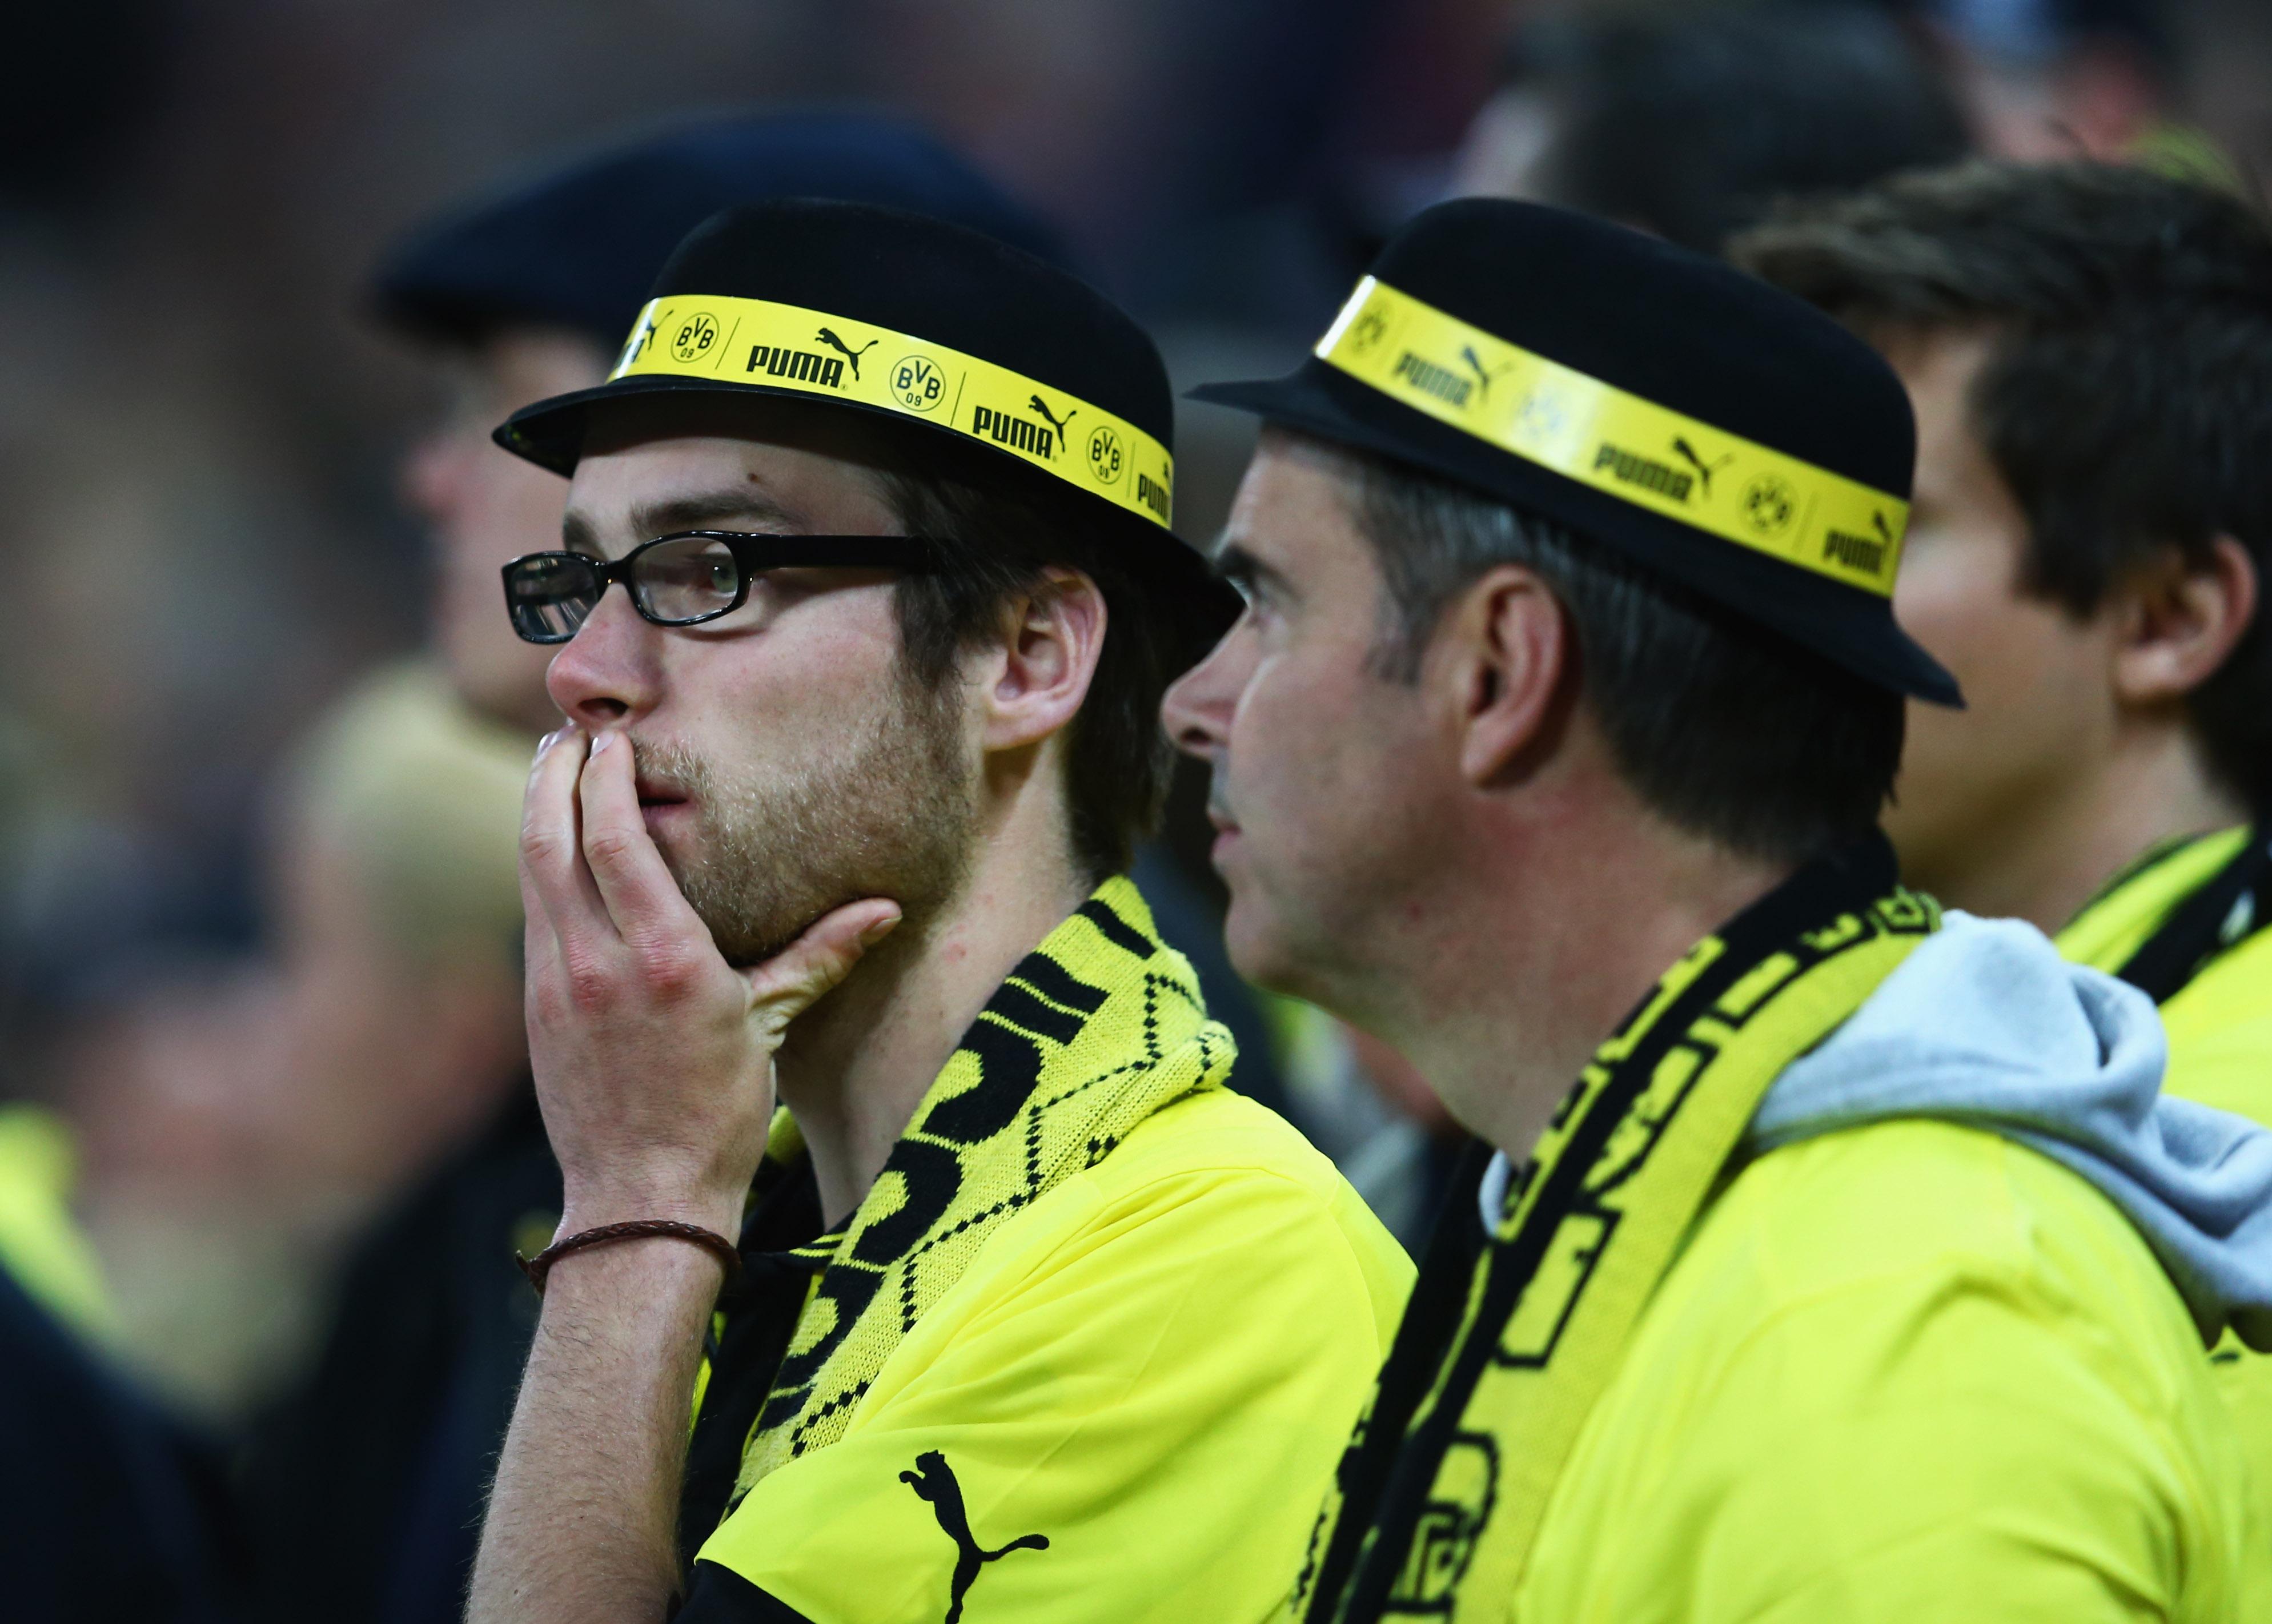 Bundesliga, Week 17: Freiburg draw, stay below Dortmund